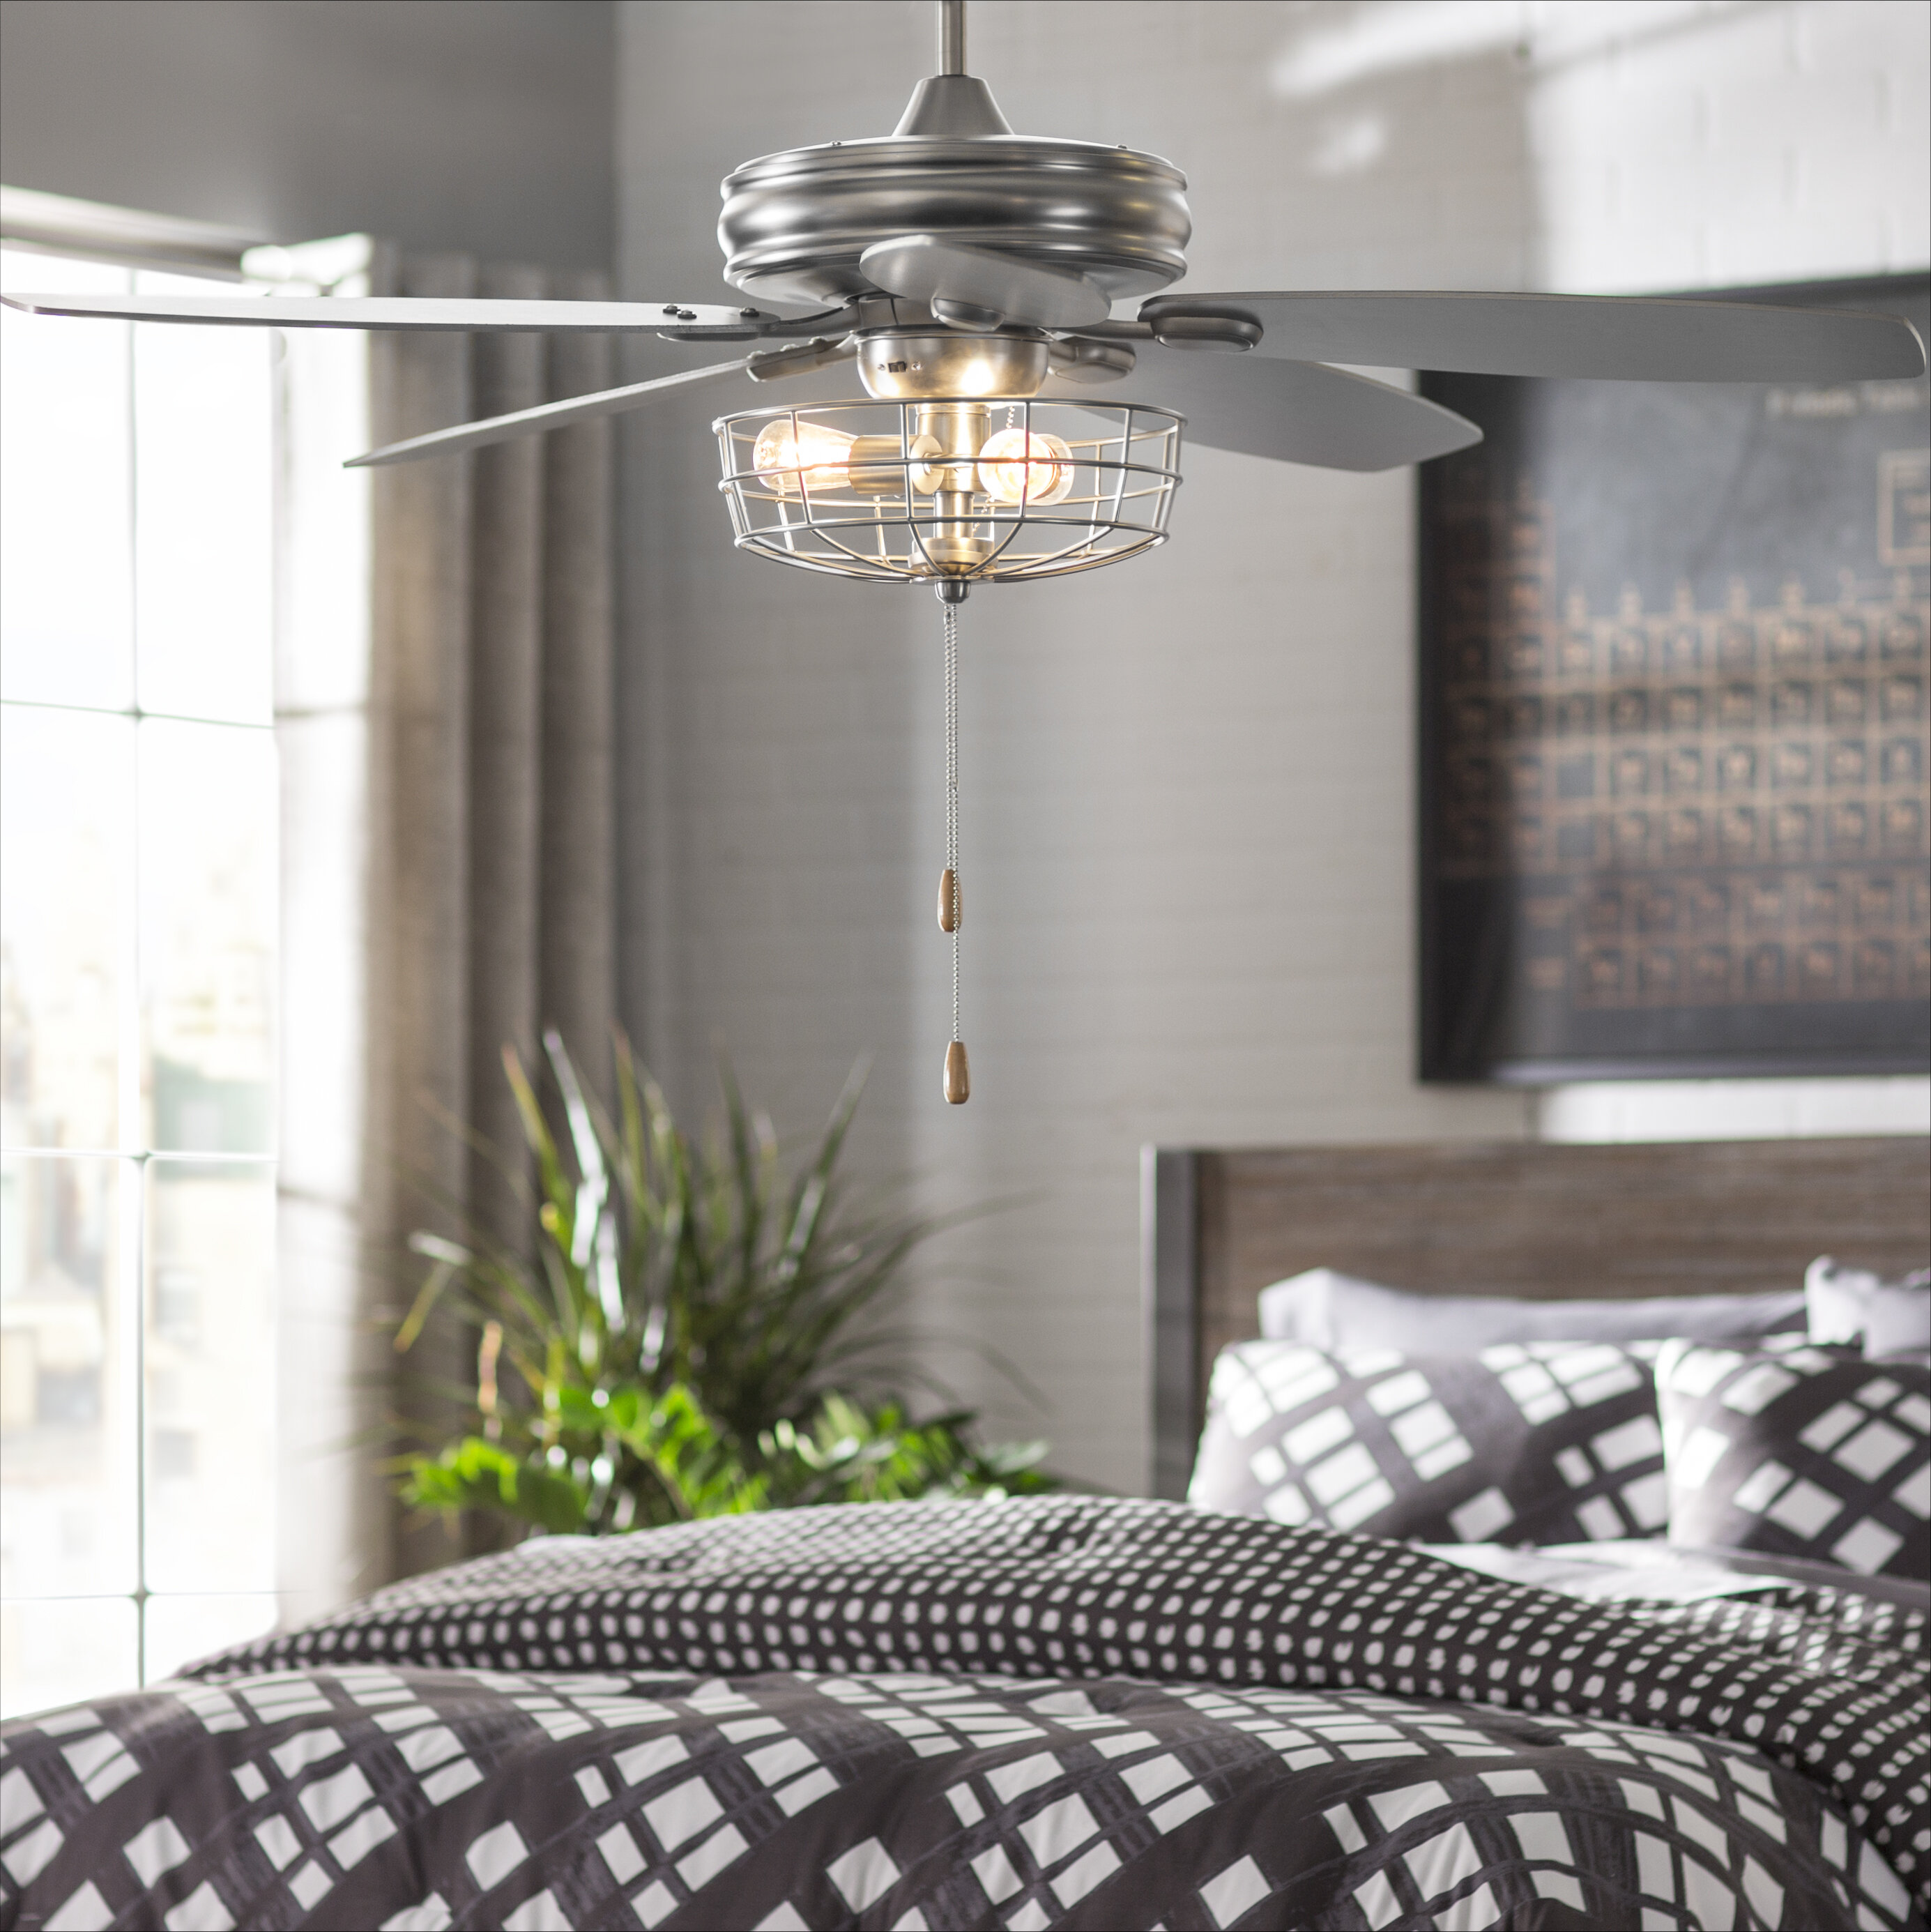 Trent austin design 52 kyla 5 blade ceiling fan reviews wayfair aloadofball Choice Image